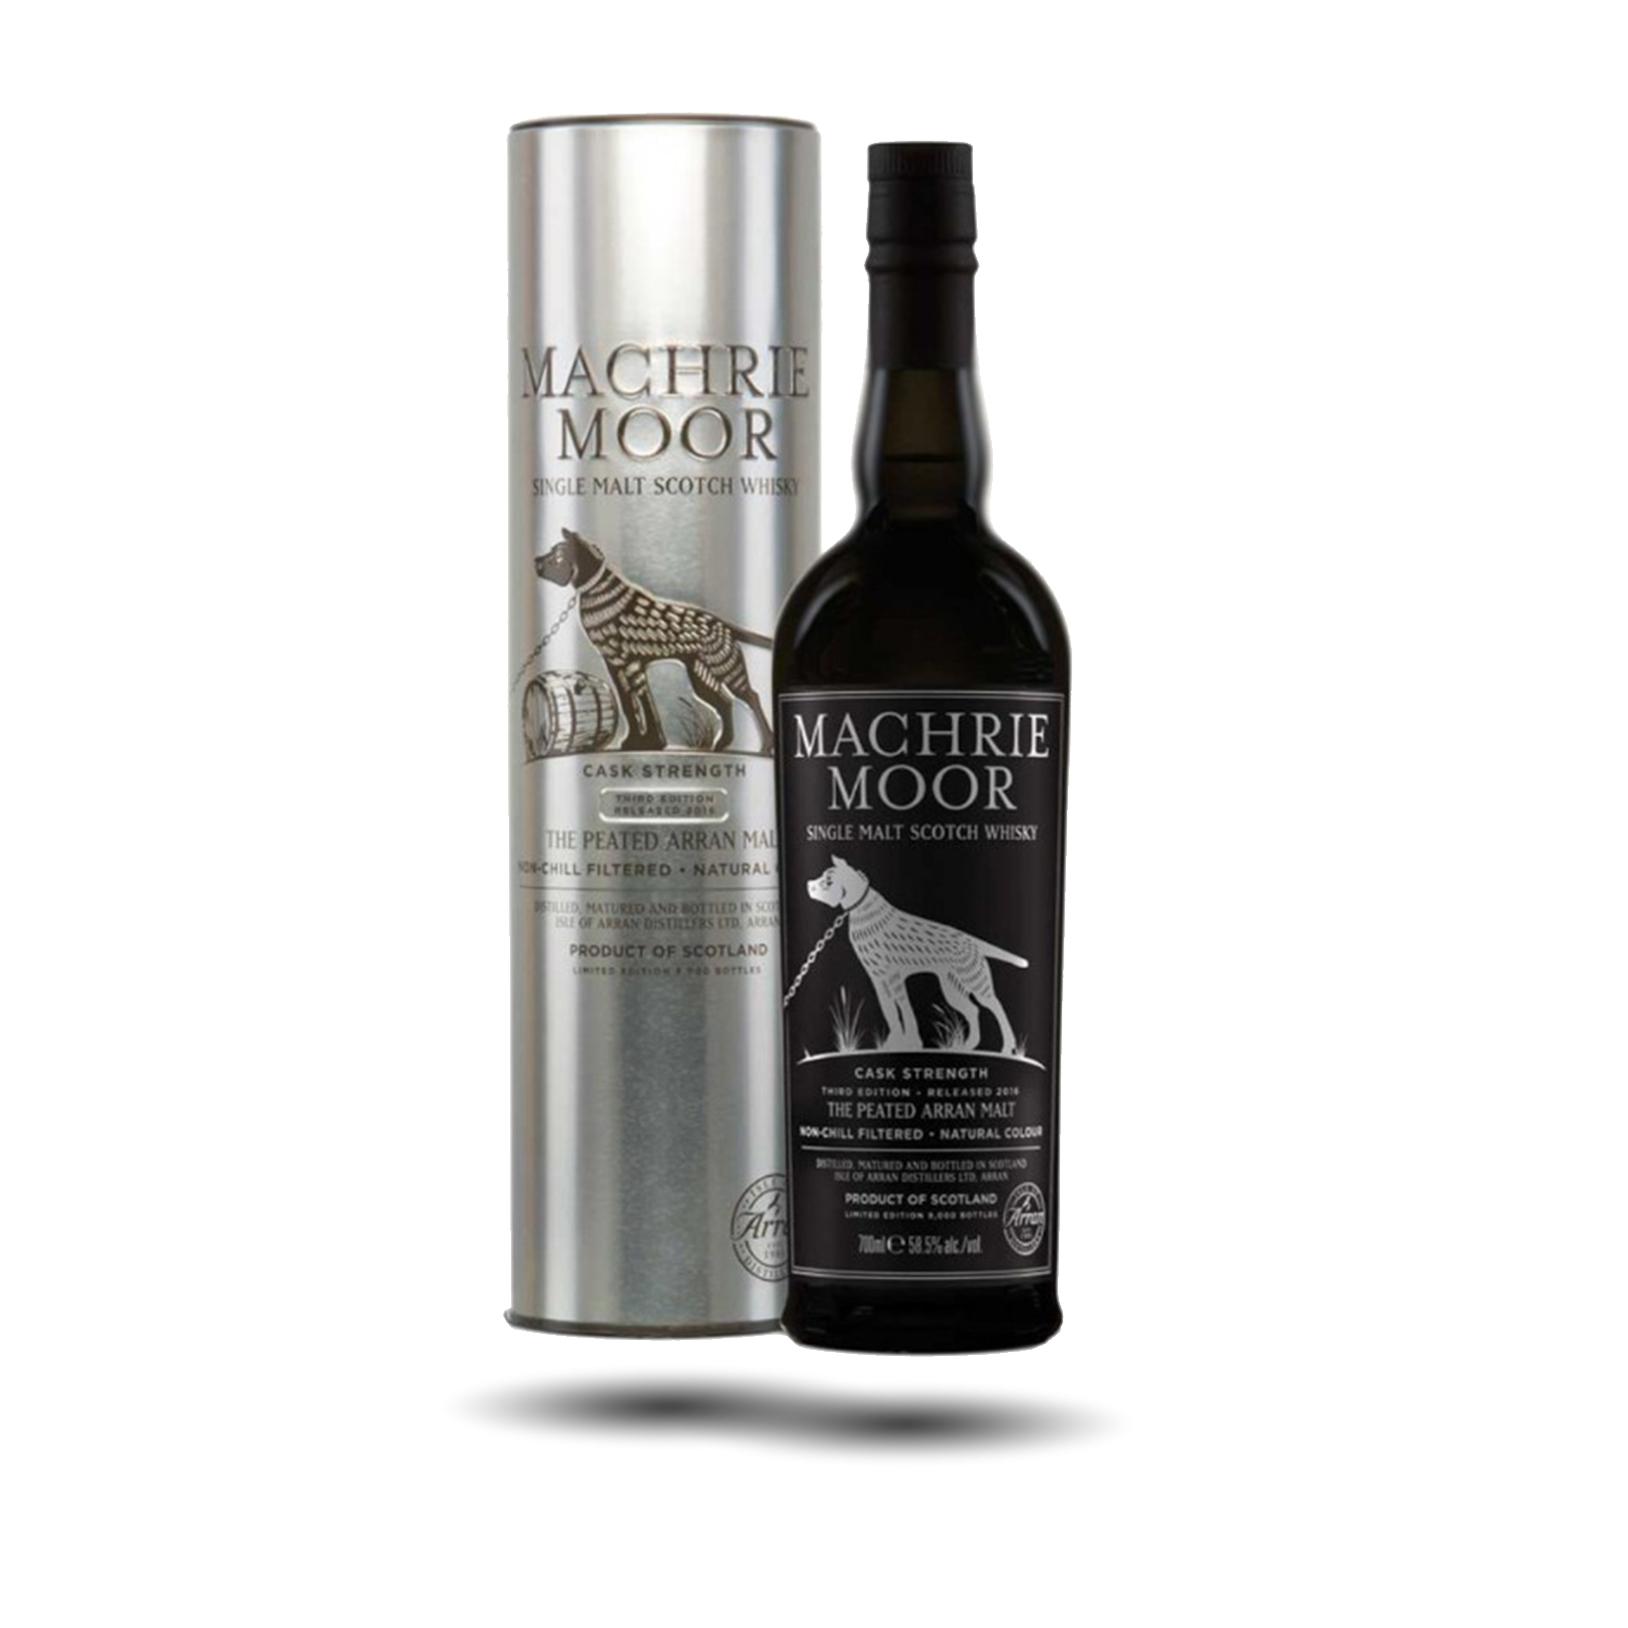 Escocia - Single Malt Scotch Whisky, Arran, Machrie Moor